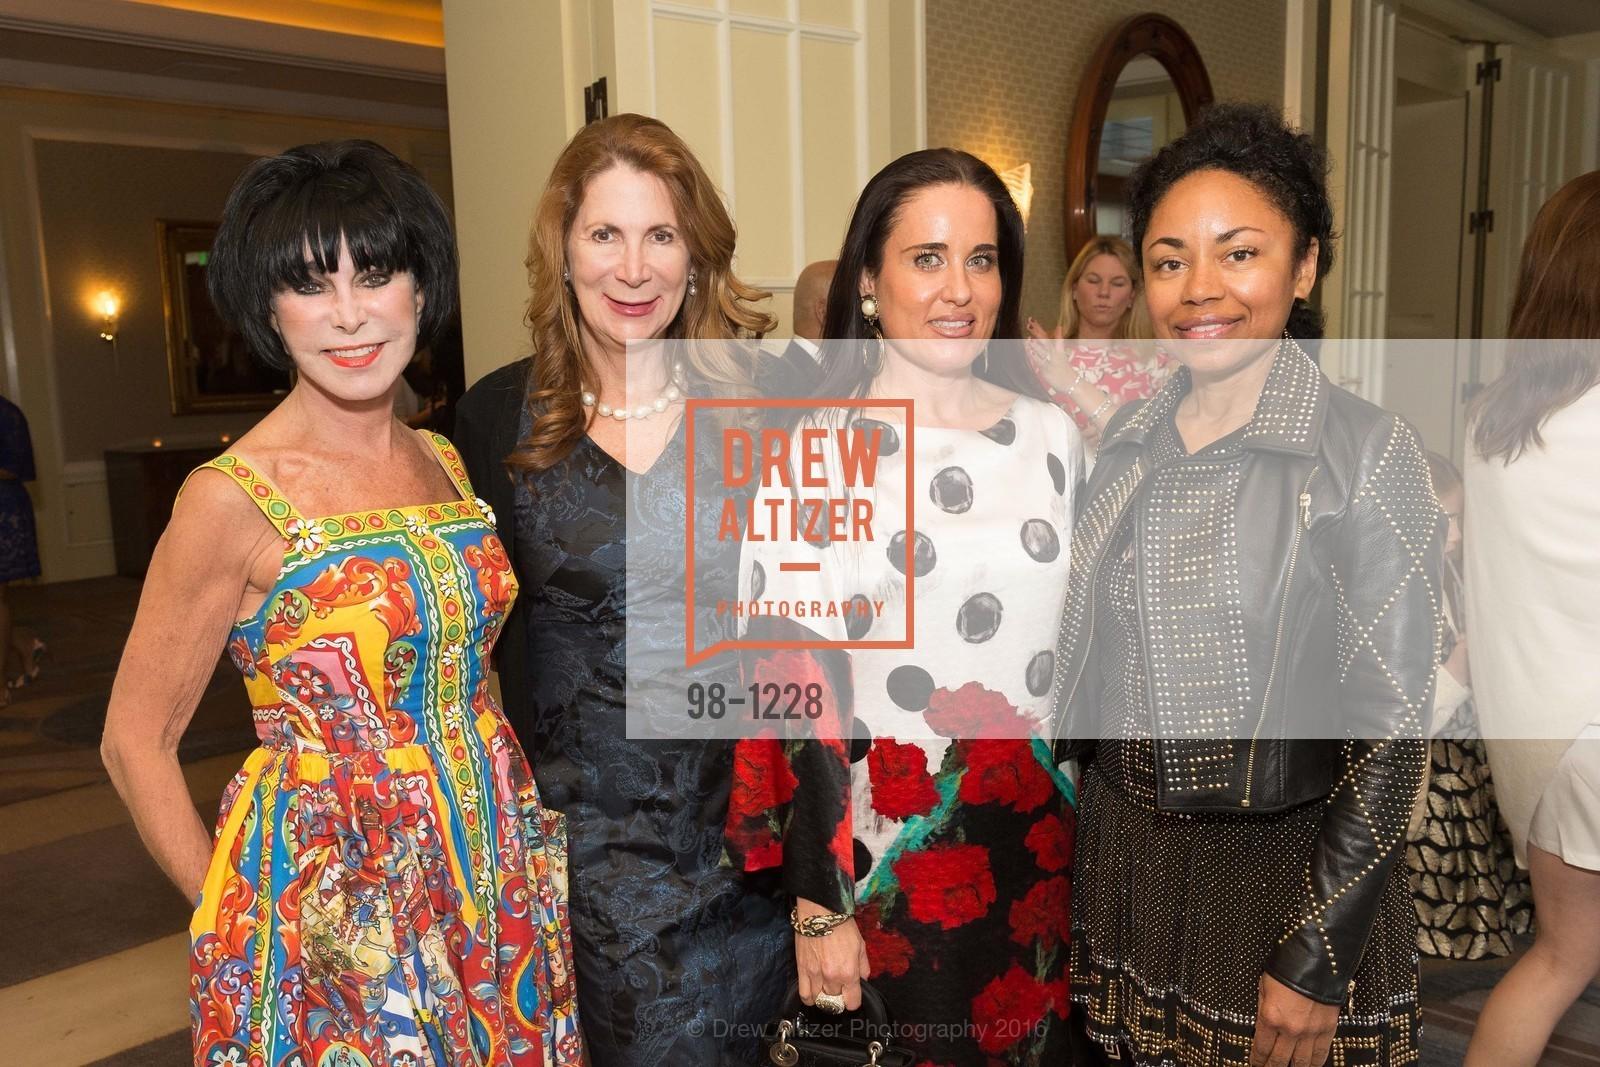 Marilyn Cabak, Patricia Ferrin Loucks, Natalia Urrutia, Tanya Powell, Photo #98-1228